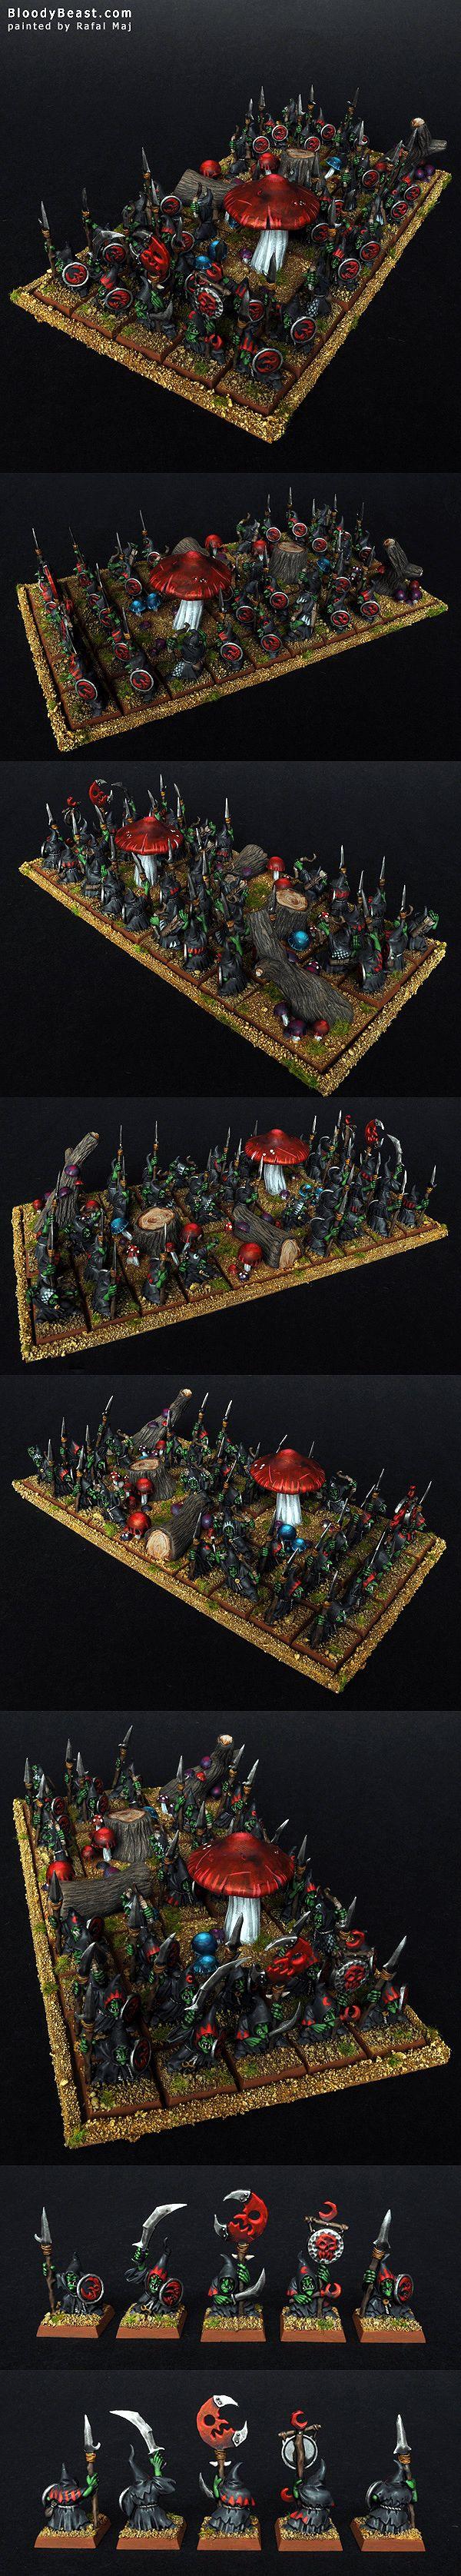 Night Goblins from Bloodybeast